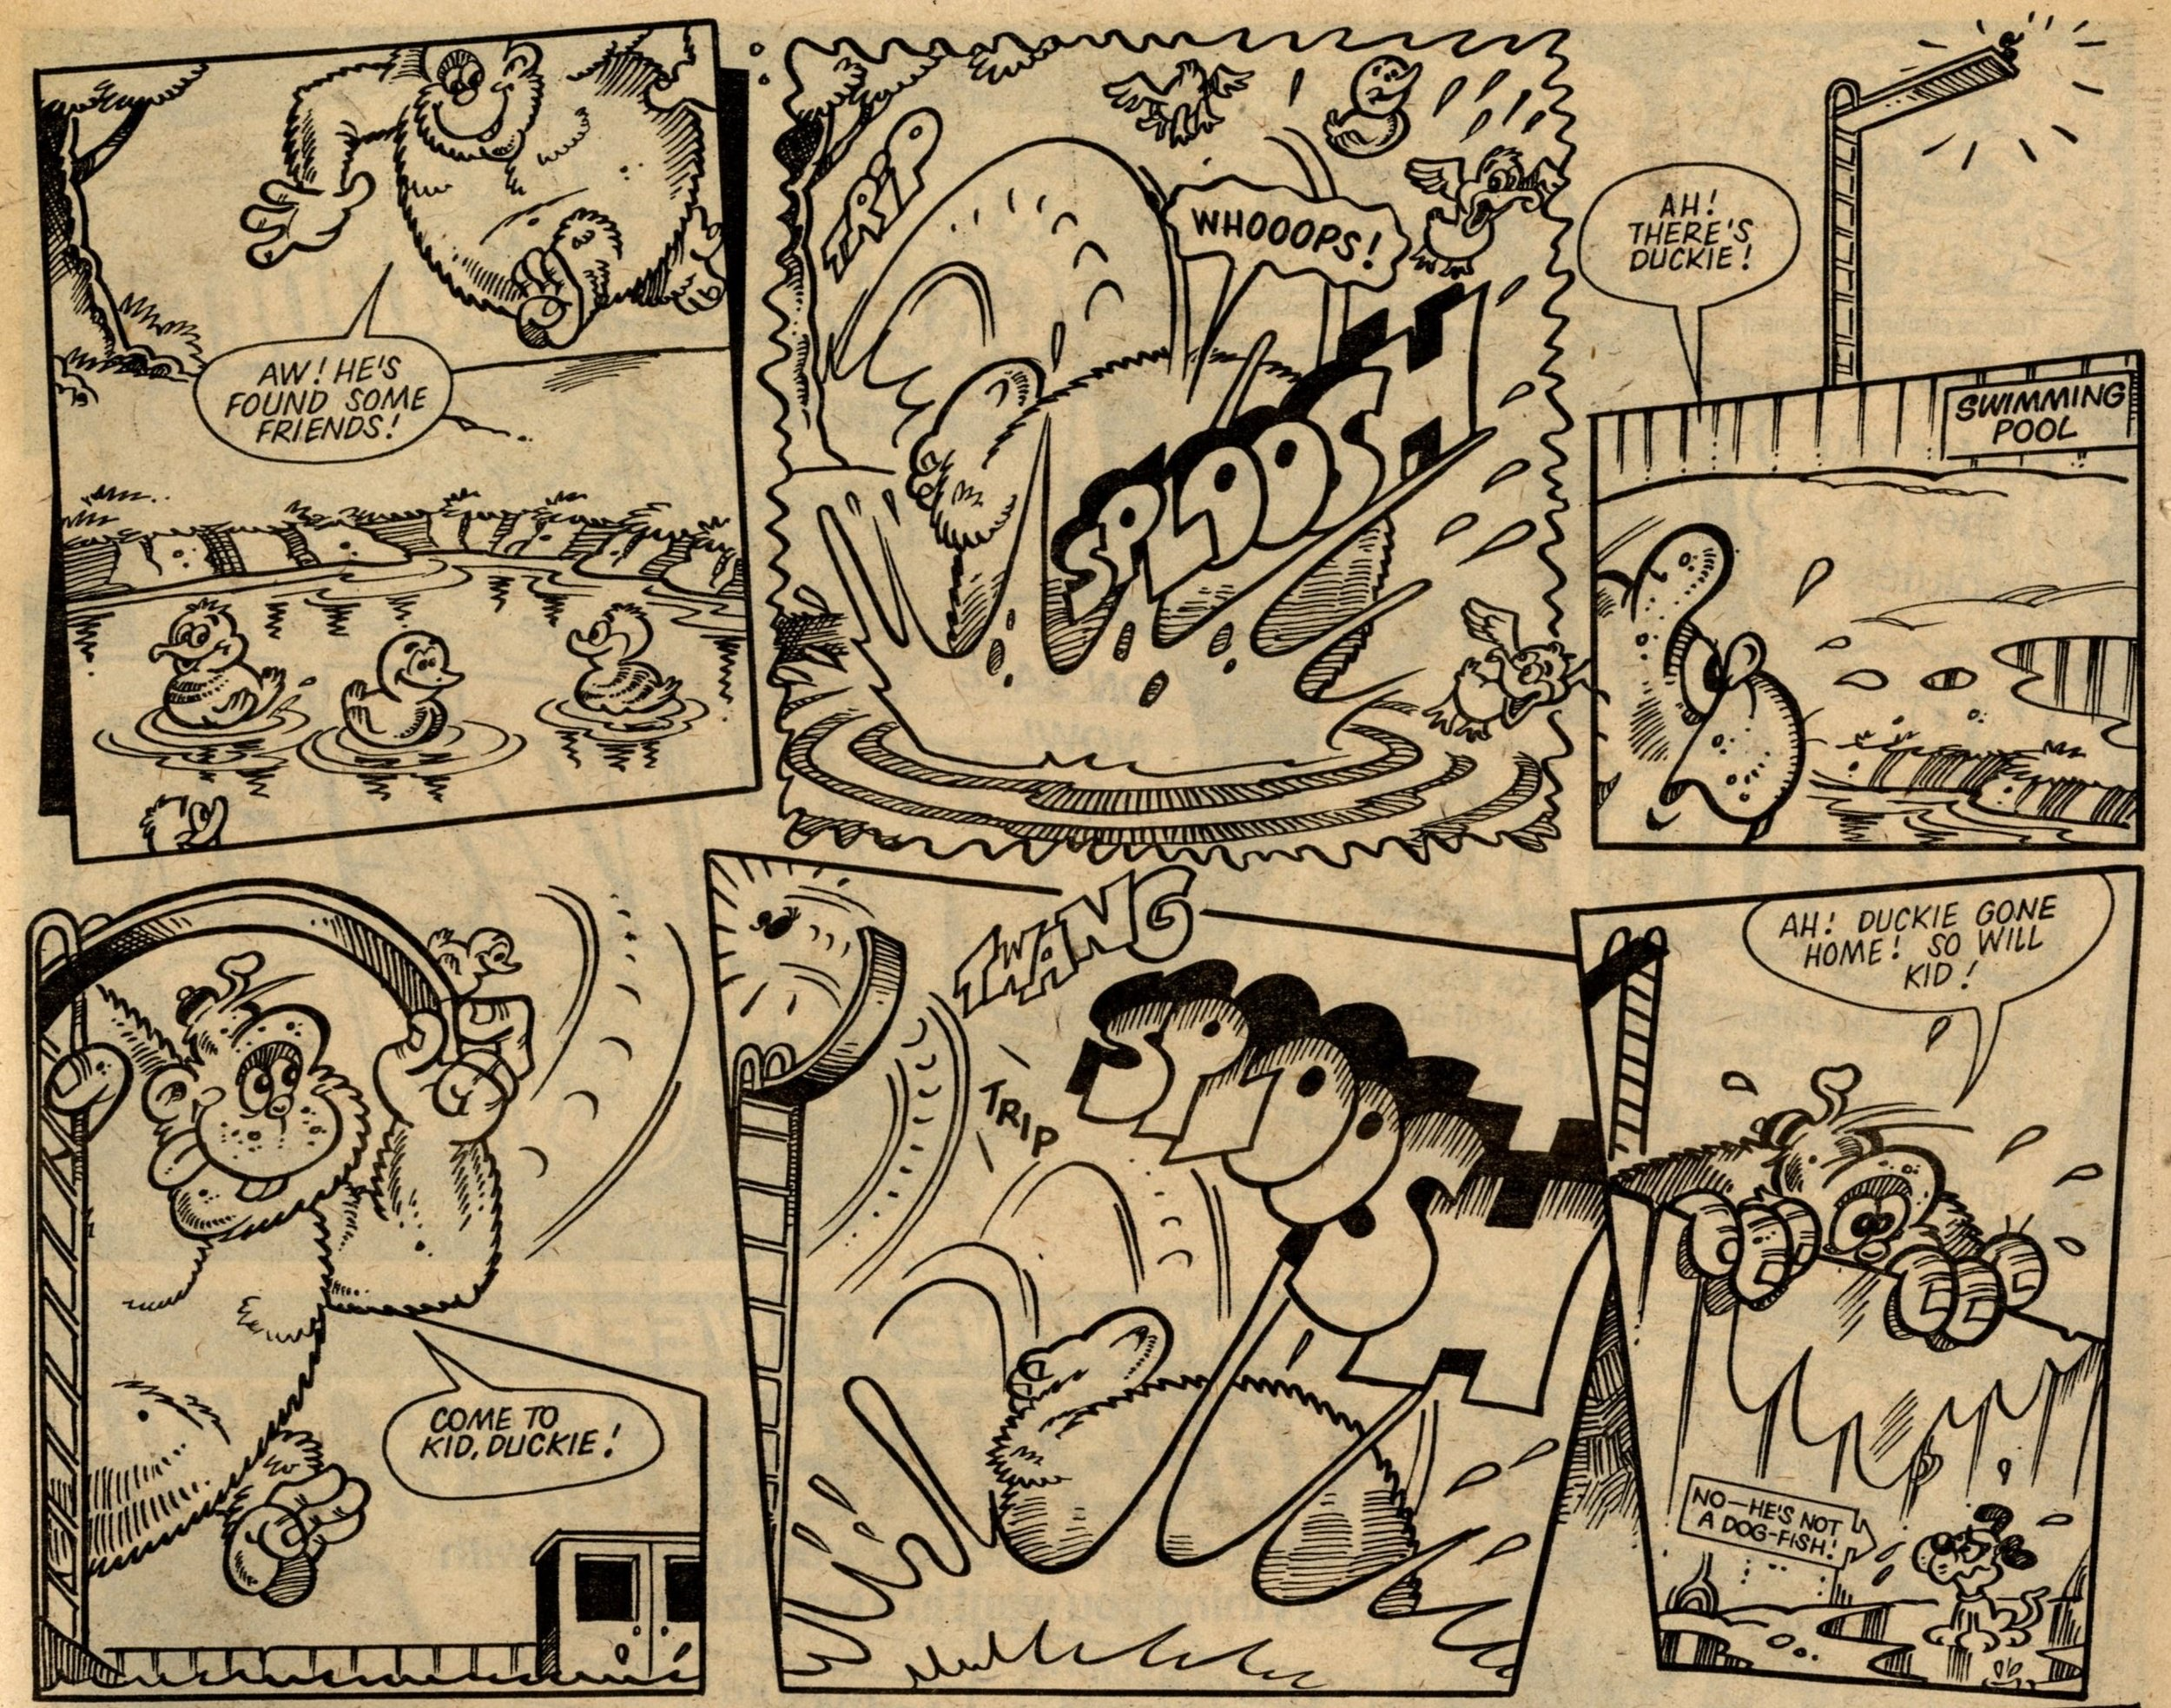 Kid Kong: Rob Lee (artist)